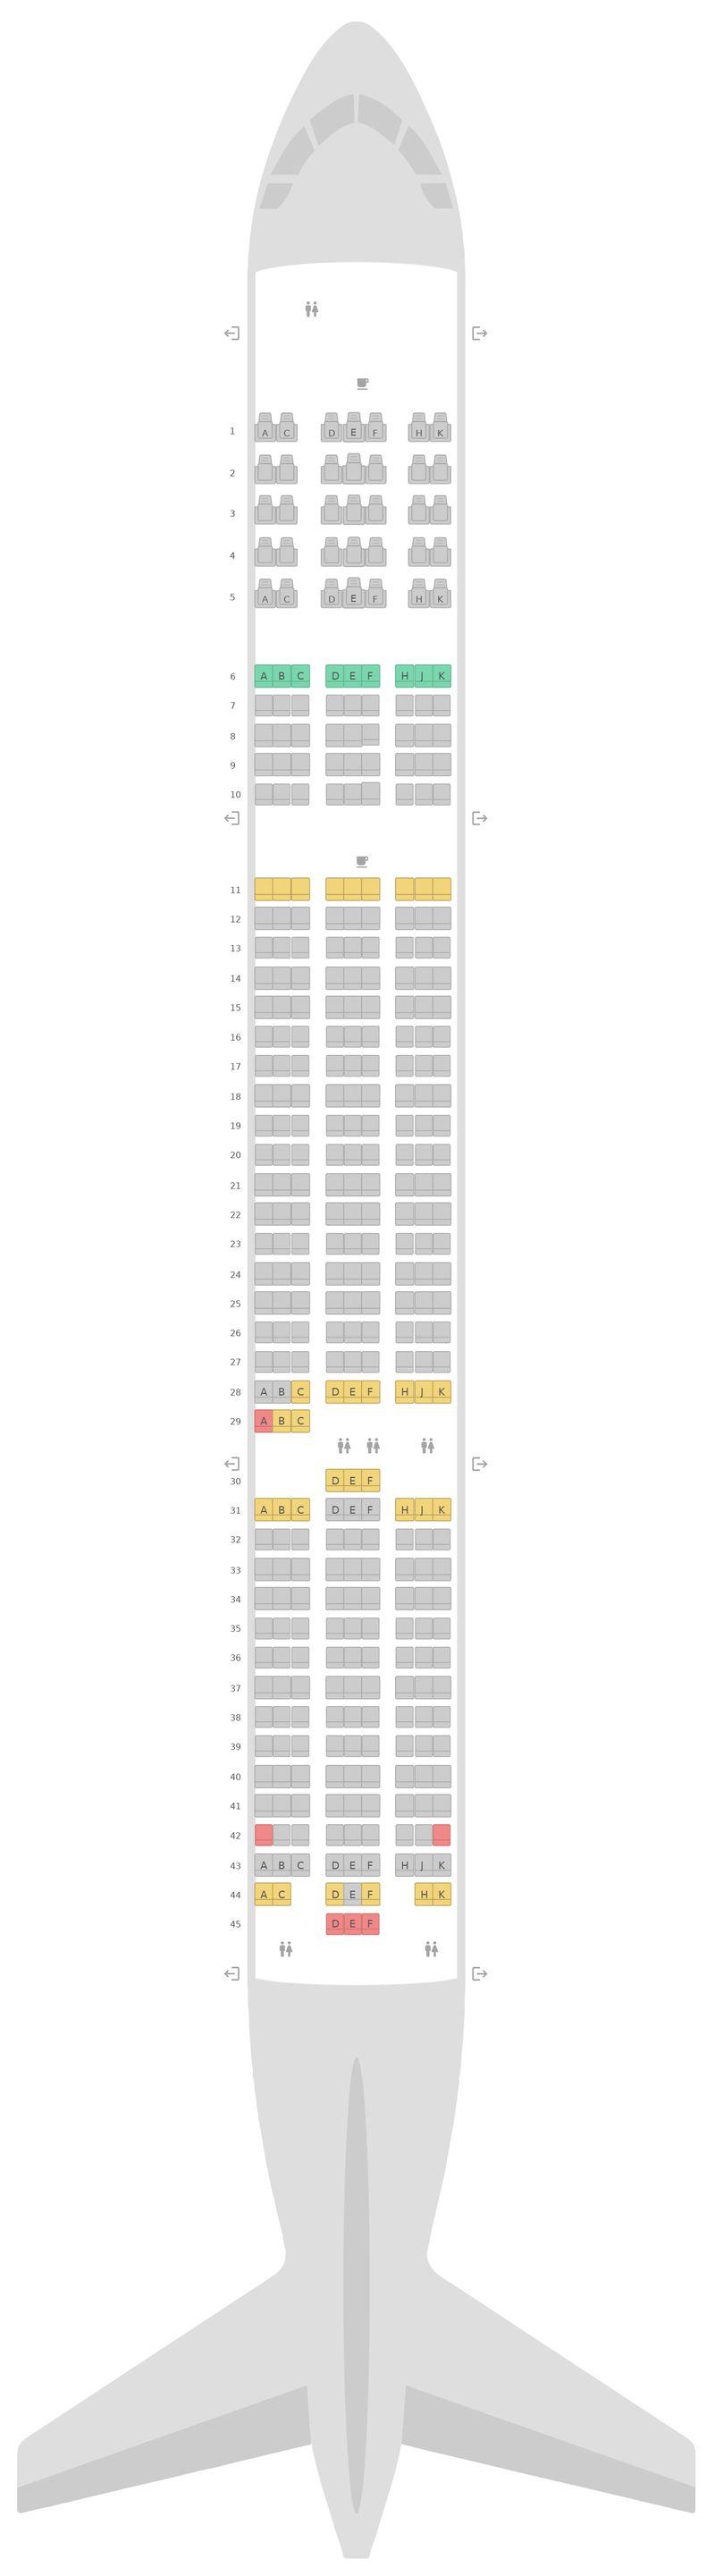 Sitzplan Boeing 787-9 (789) Scoot